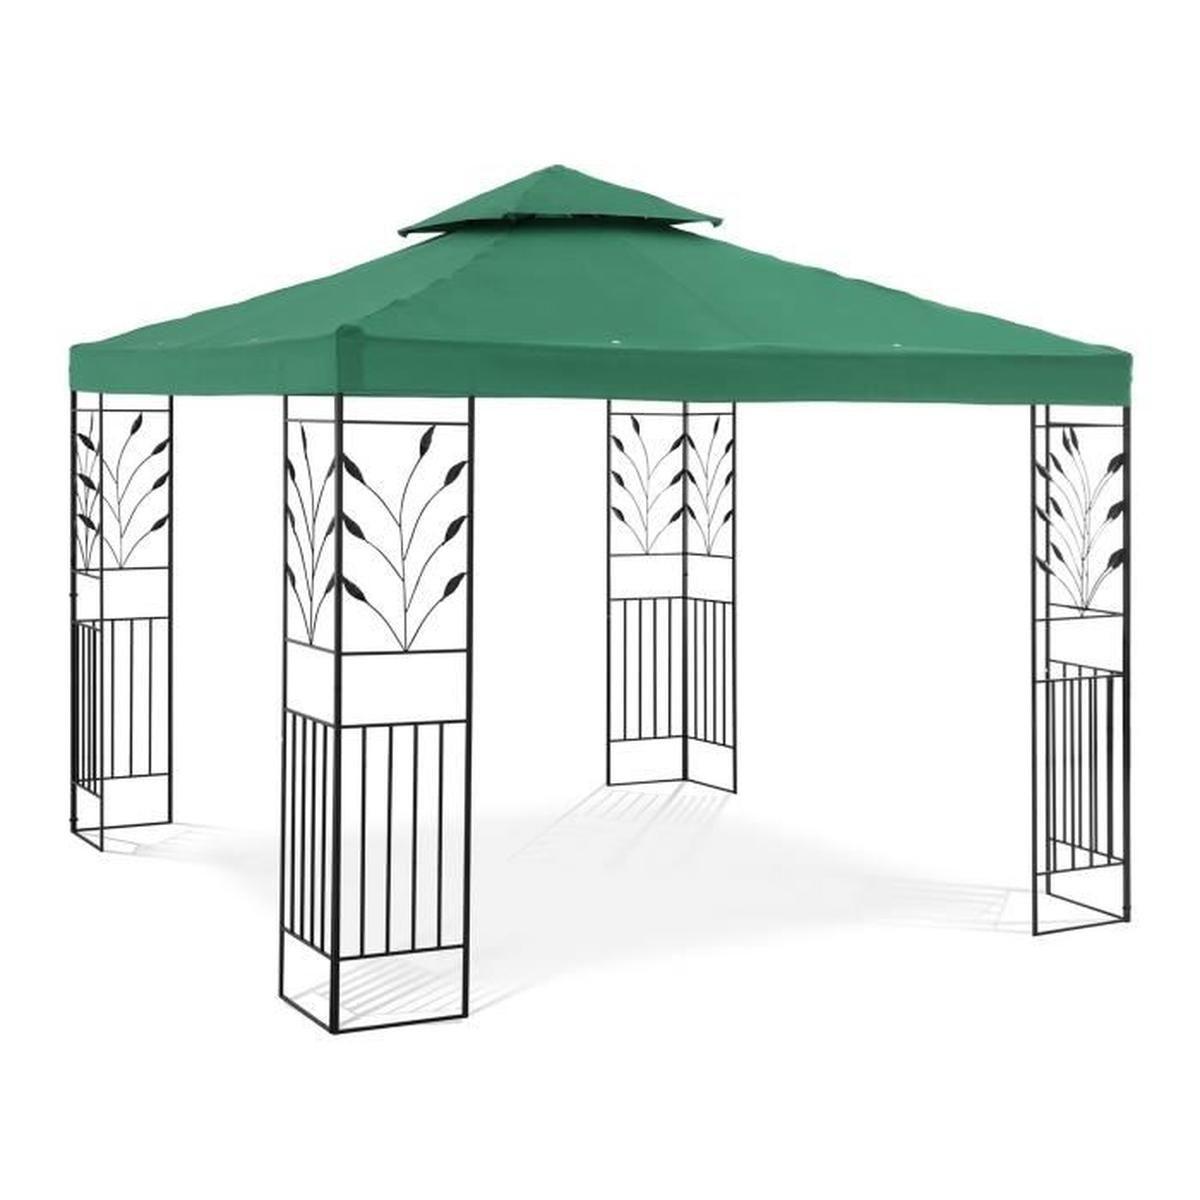 Pergola De Jardin Terrasse En Kit Tonnelle Store Toiture Uniprodo  Uni_Pergola_3X3G (3 X 3 M, Faîte 2,6 M, Toile 180G/m2) tout Pergola Cdiscount